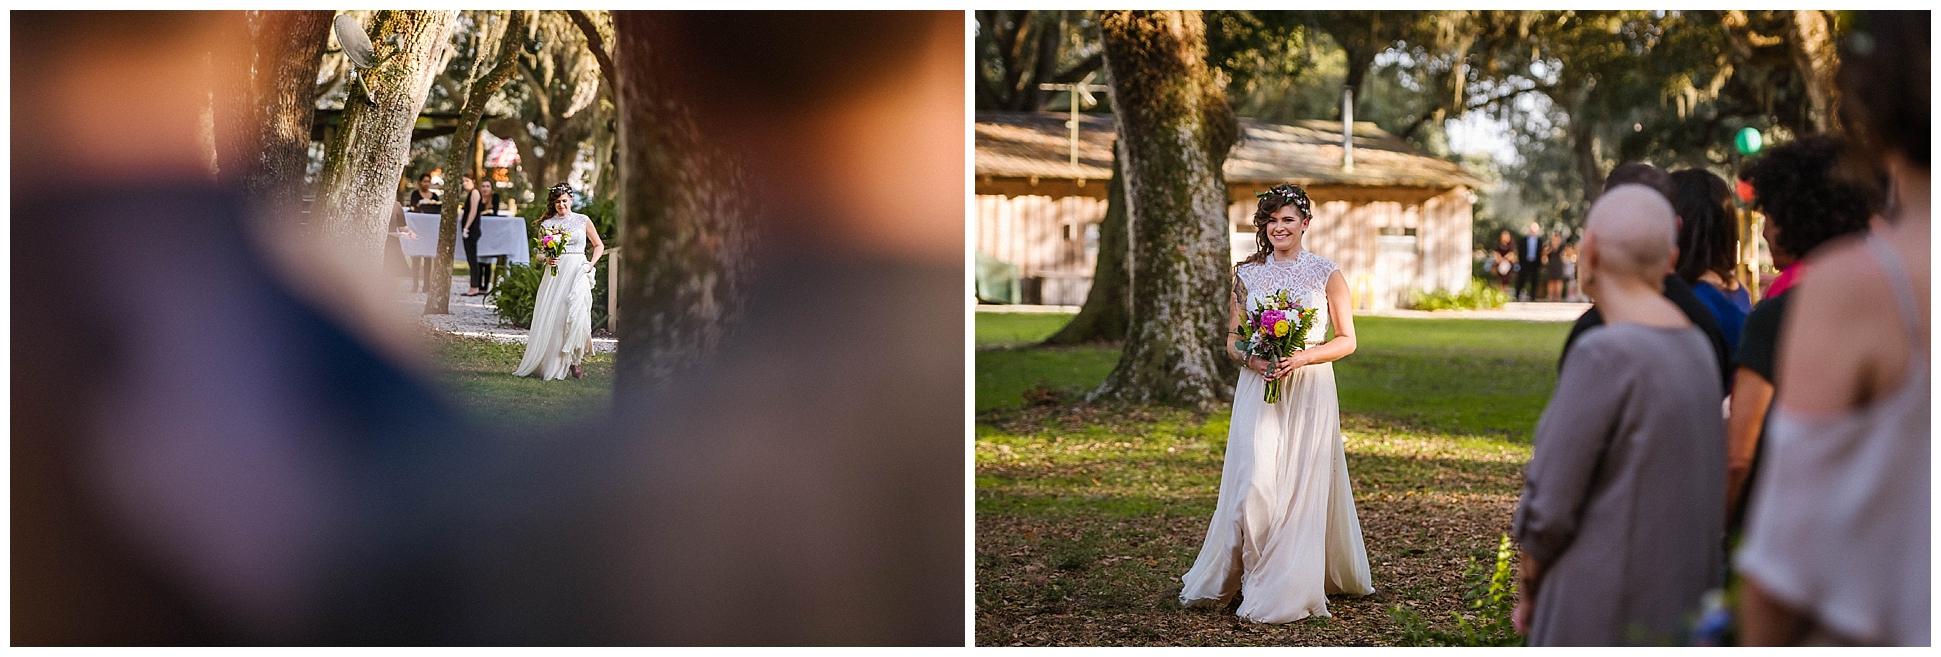 magical-outdoor-florida-wedding-smoke-bombs-flowers-crown-beard_0027.jpg